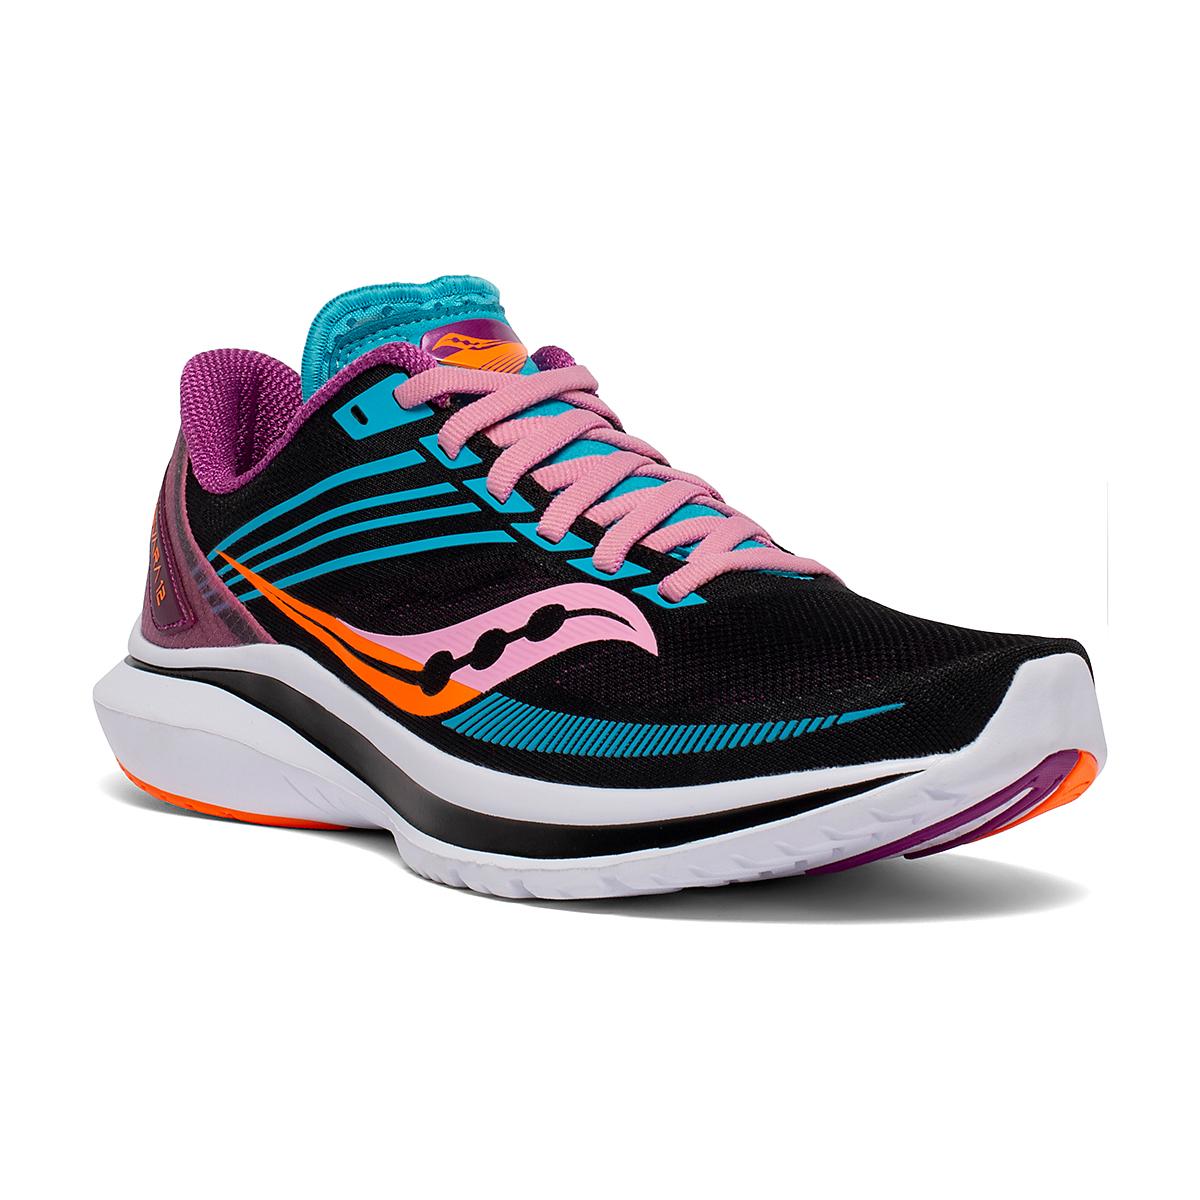 Women's Saucony Kinvara 12 Running Shoe - Color: Future/Black - Size: 5 - Width: Regular, Future/Black, large, image 2